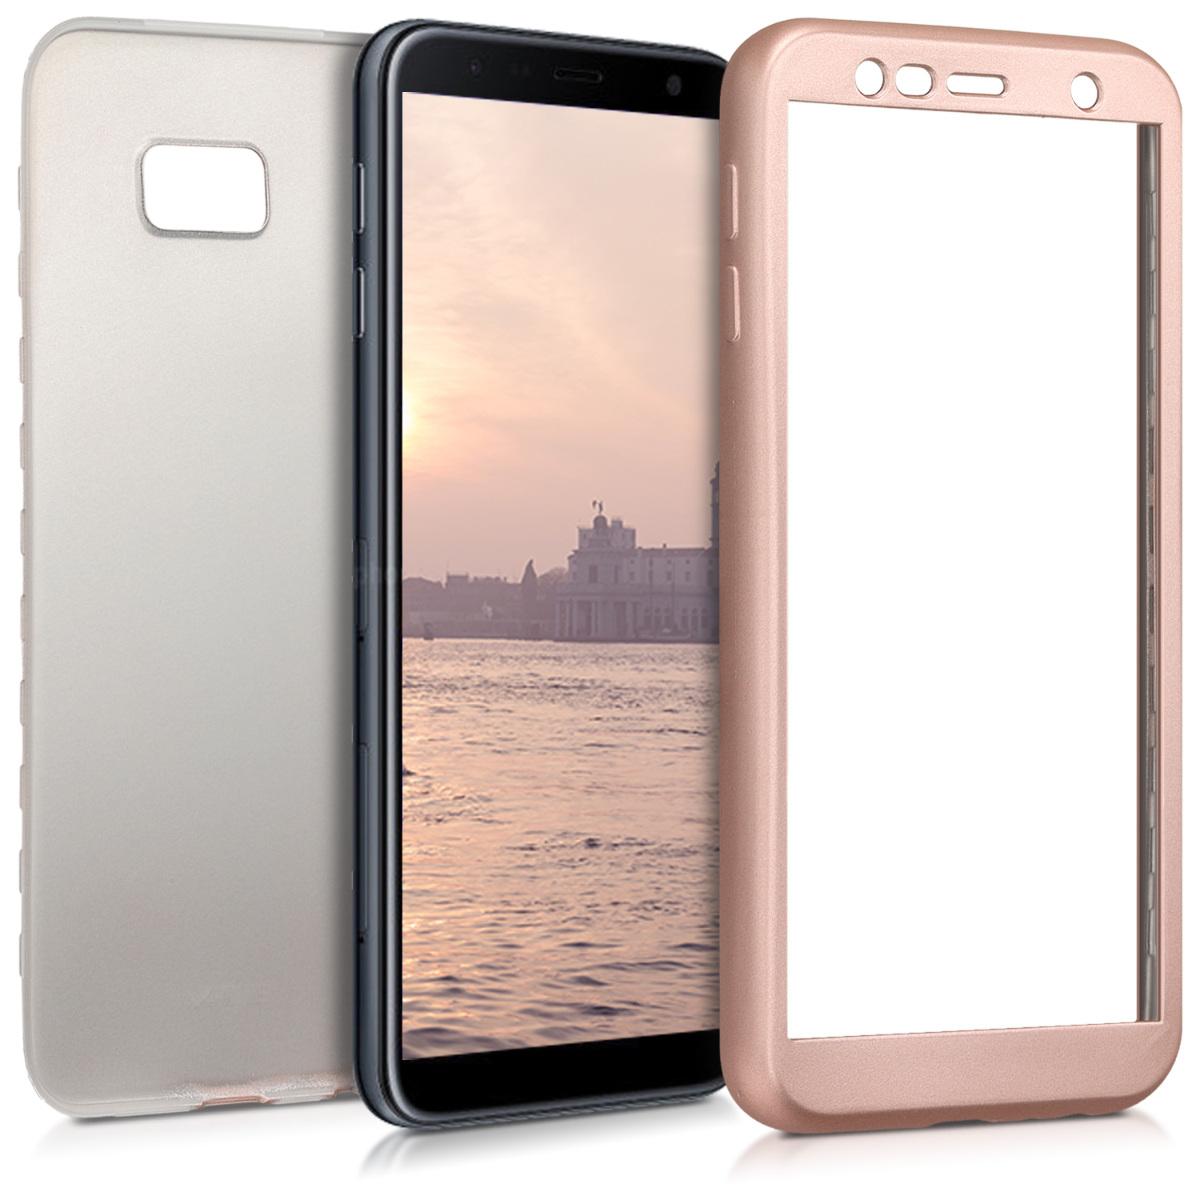 Kvalitní silikonové TPU pouzdro pro Samsung J4+ | J4 Plus DUOS - metalické starorůžové rosegold